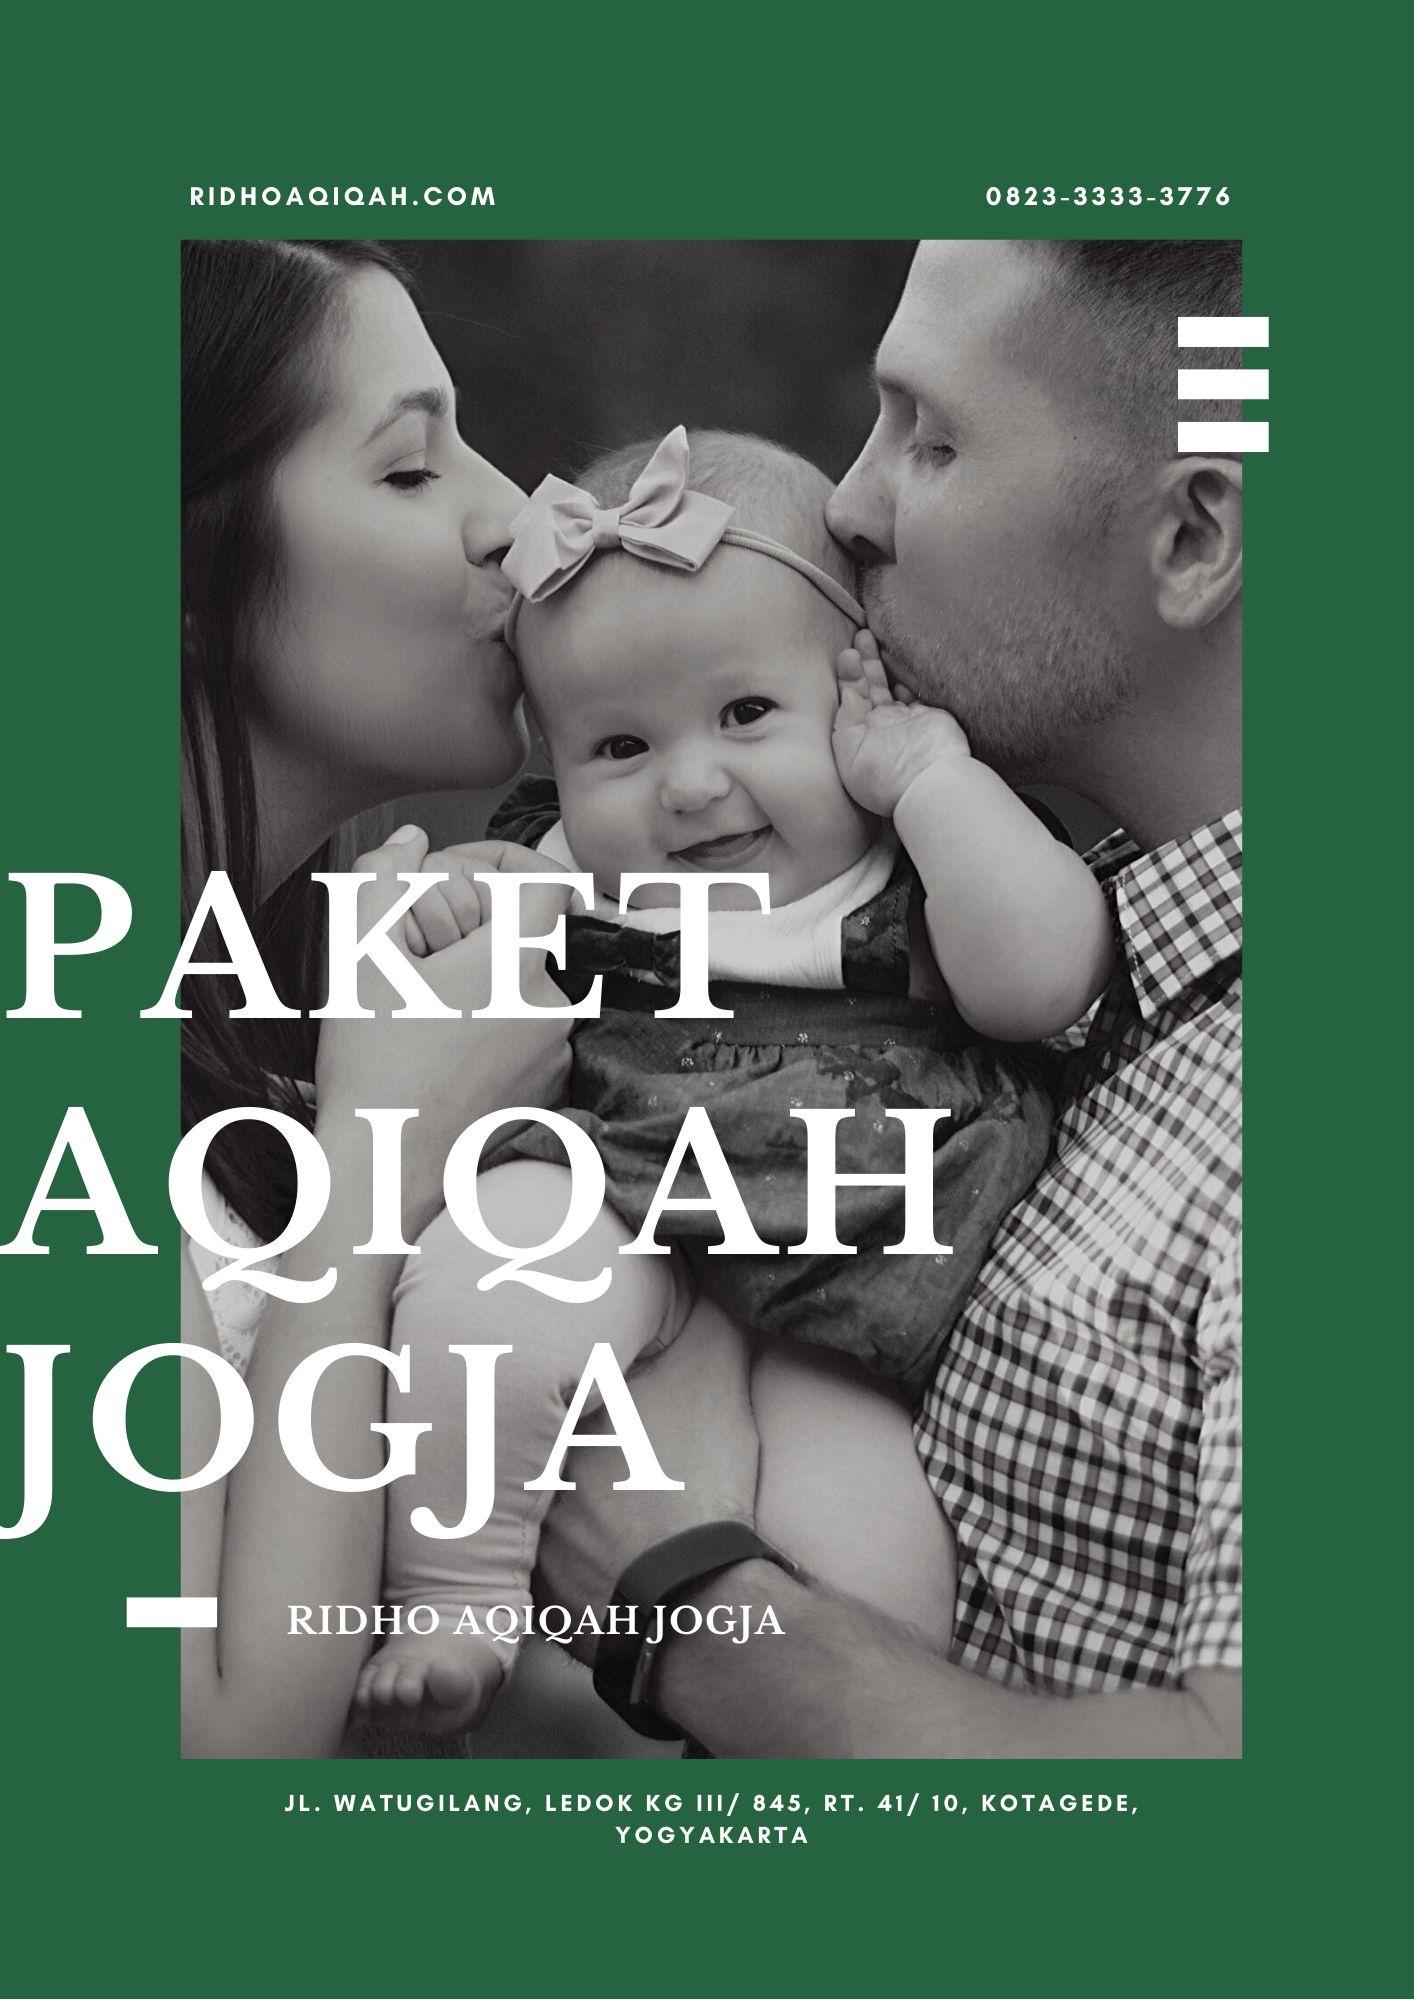 PAKET AQIQAH JOGJA (1)